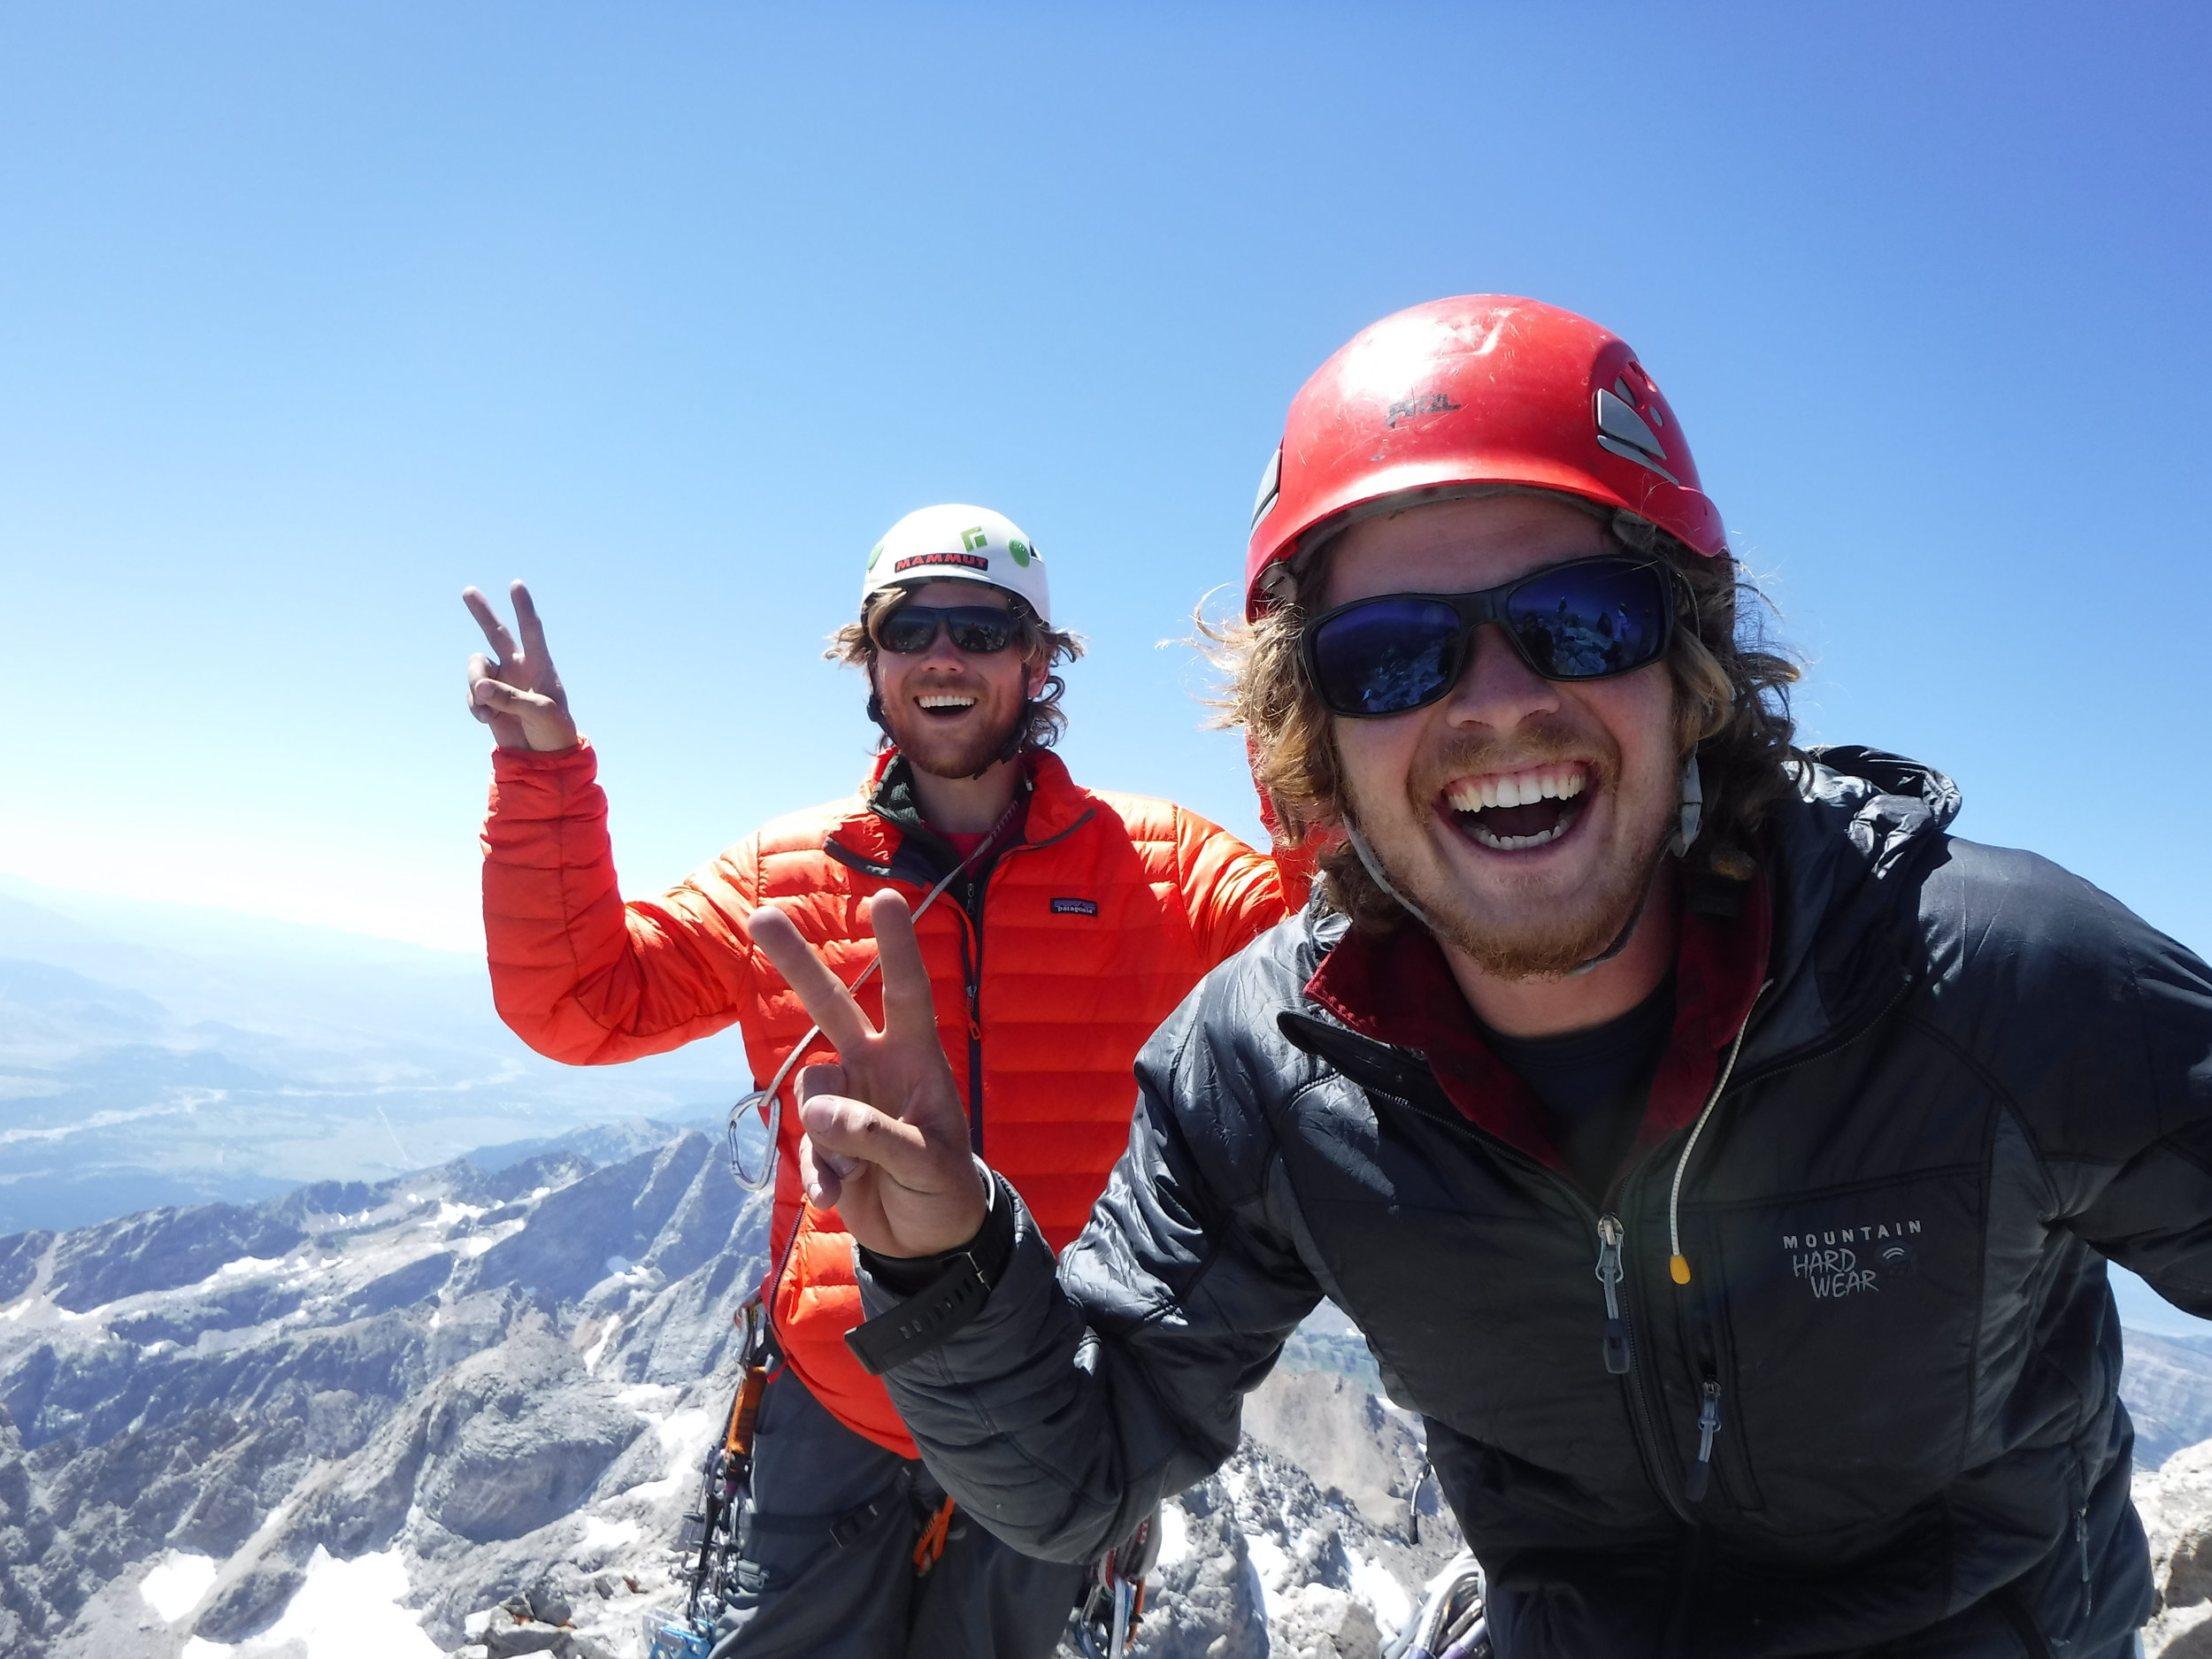 Trevor Bloom (right) and partner Matt Kneipp (left) on the summit of the Grant Teton during field work (2015)